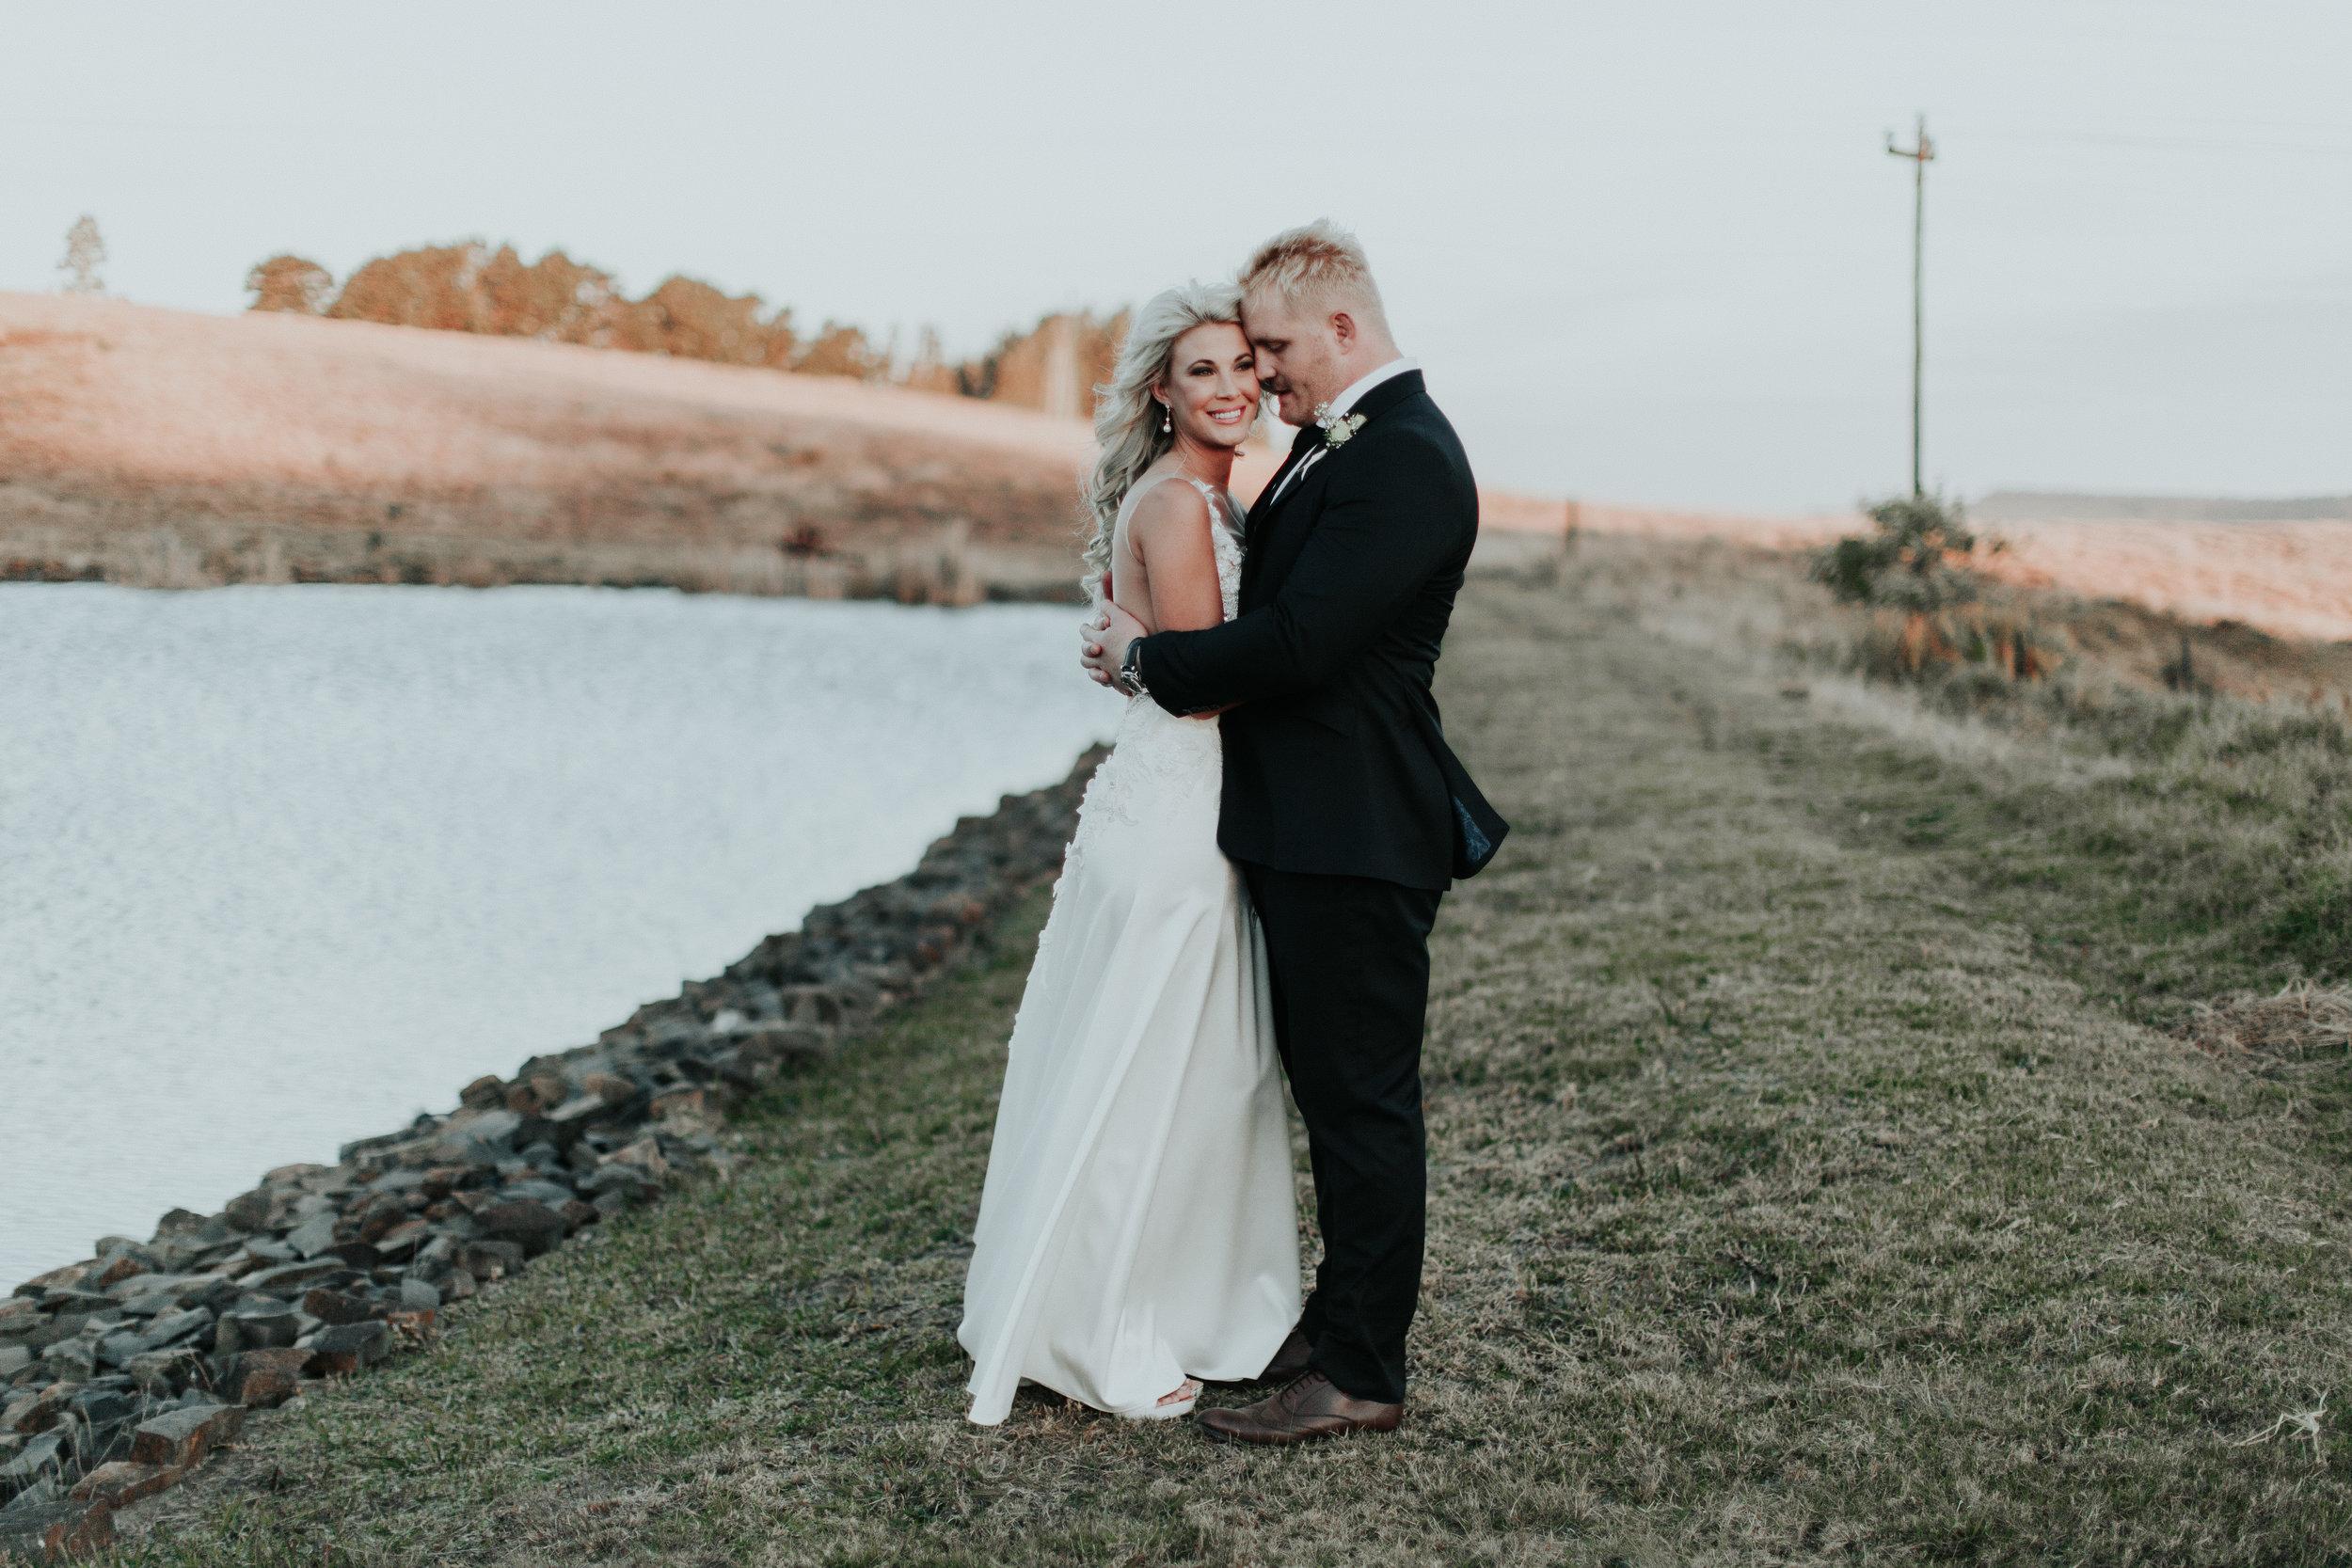 Kristi Smith Photography_Vincent&Jandre_ Wedding Photographer 24.jpg